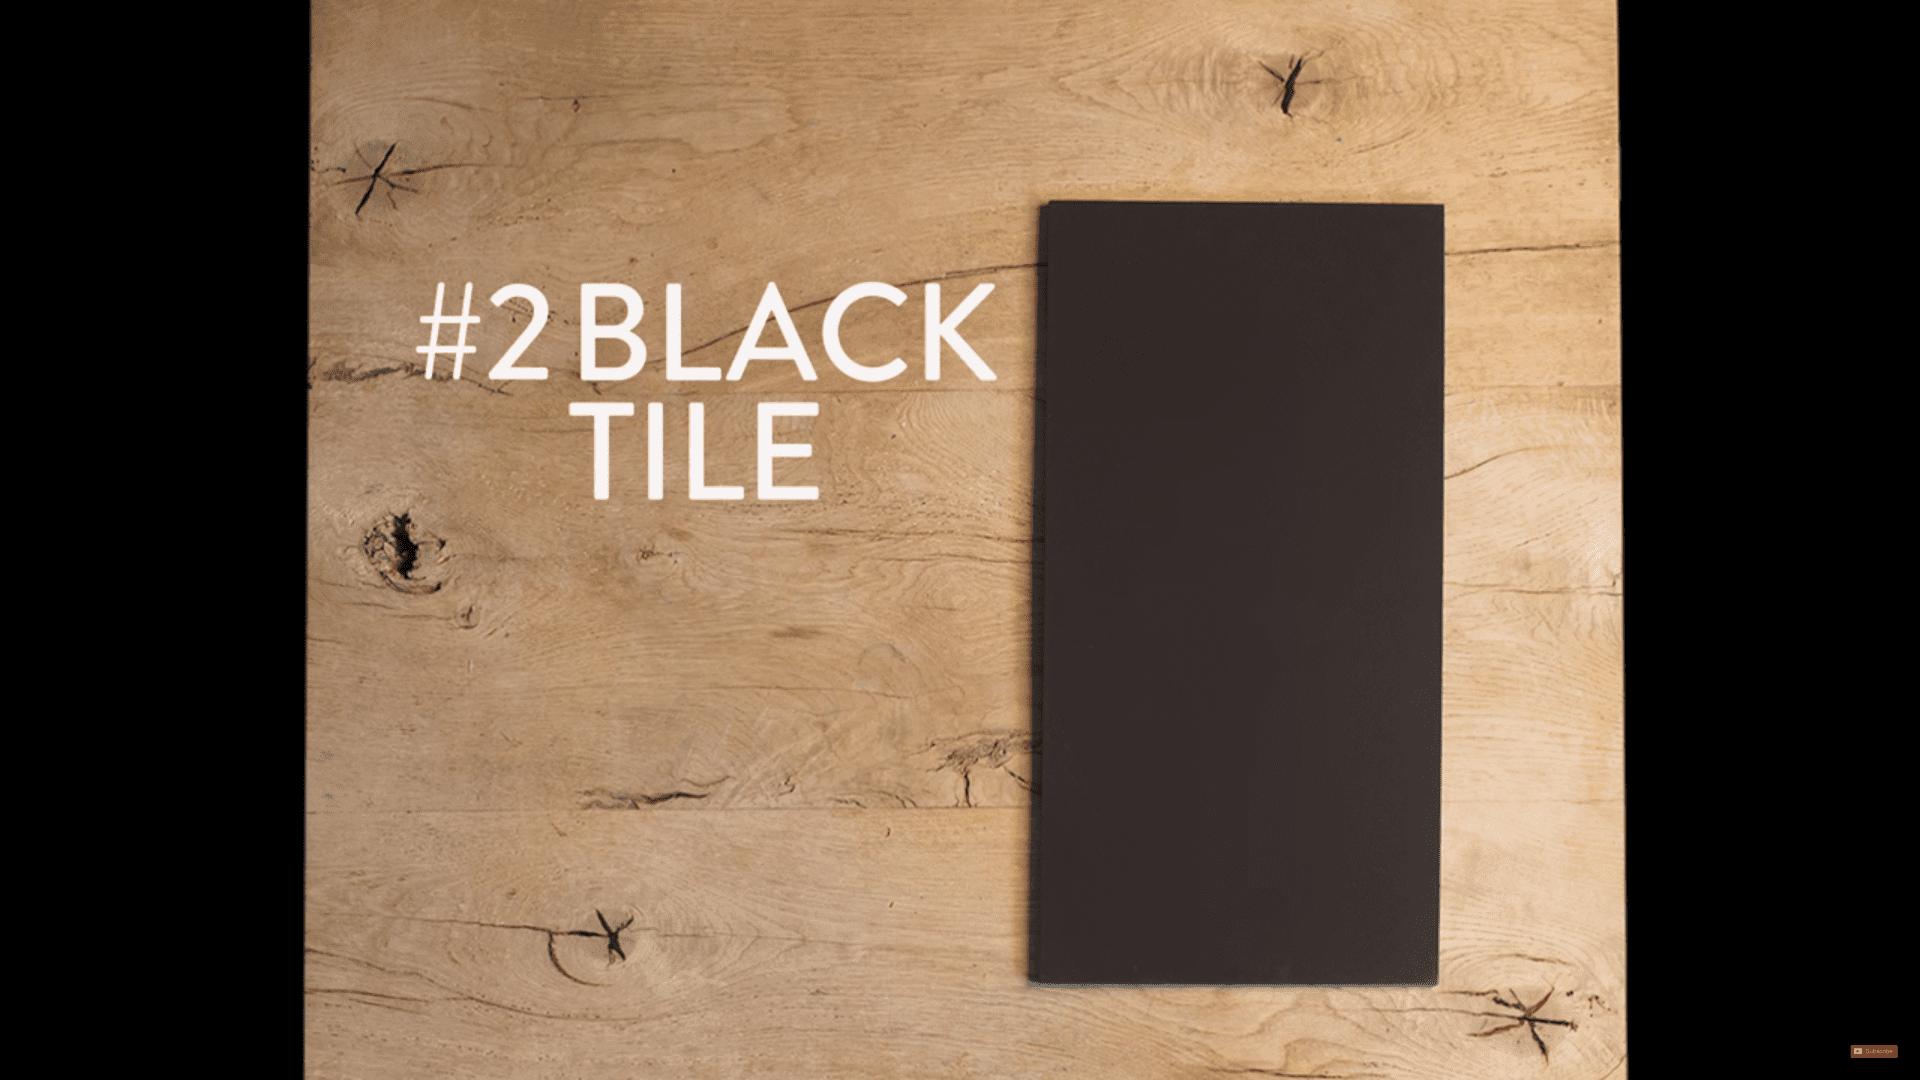 blacktile1 image